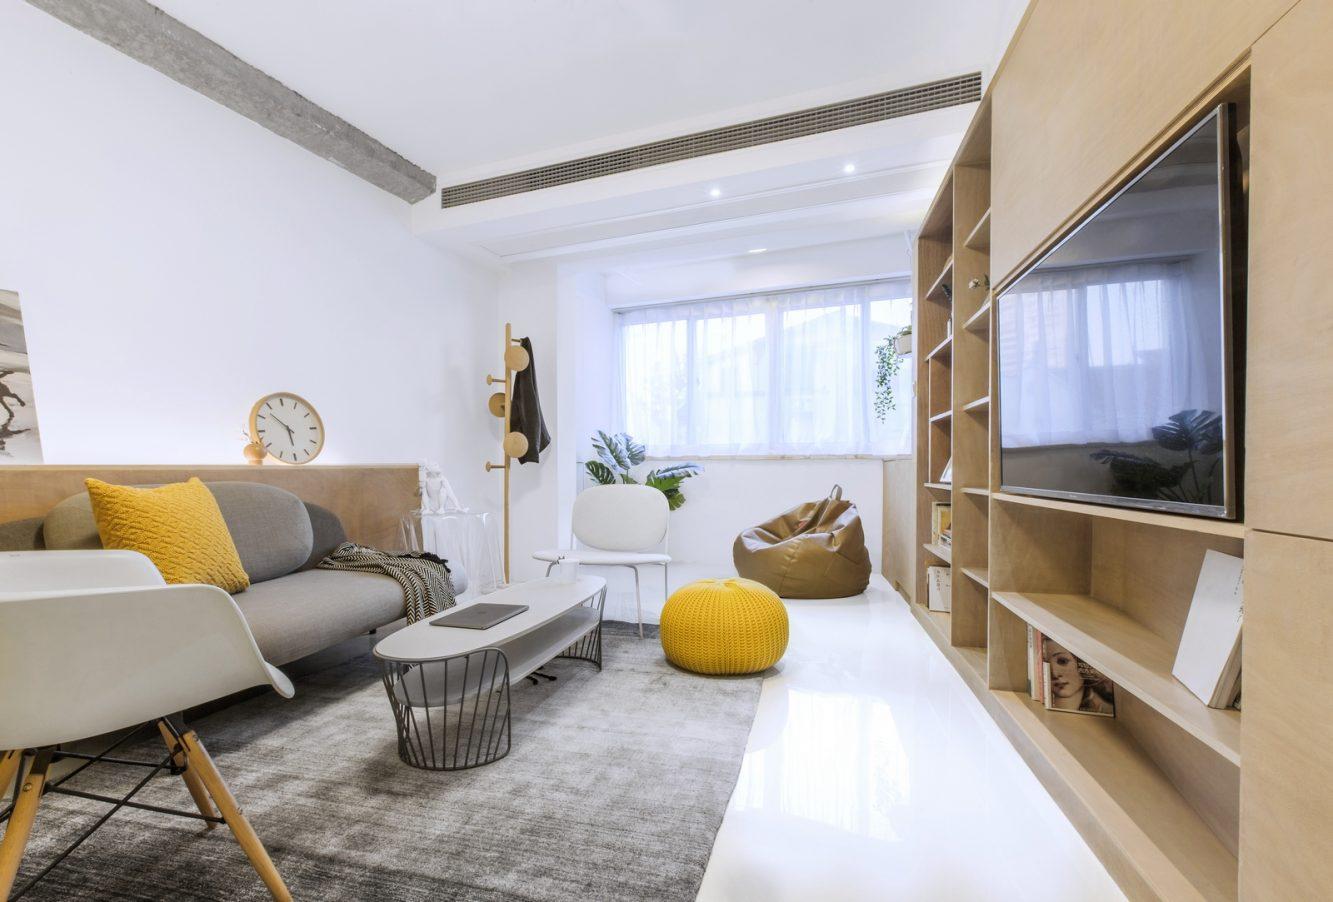 20. livingroom with natural sunlight (Copiar)